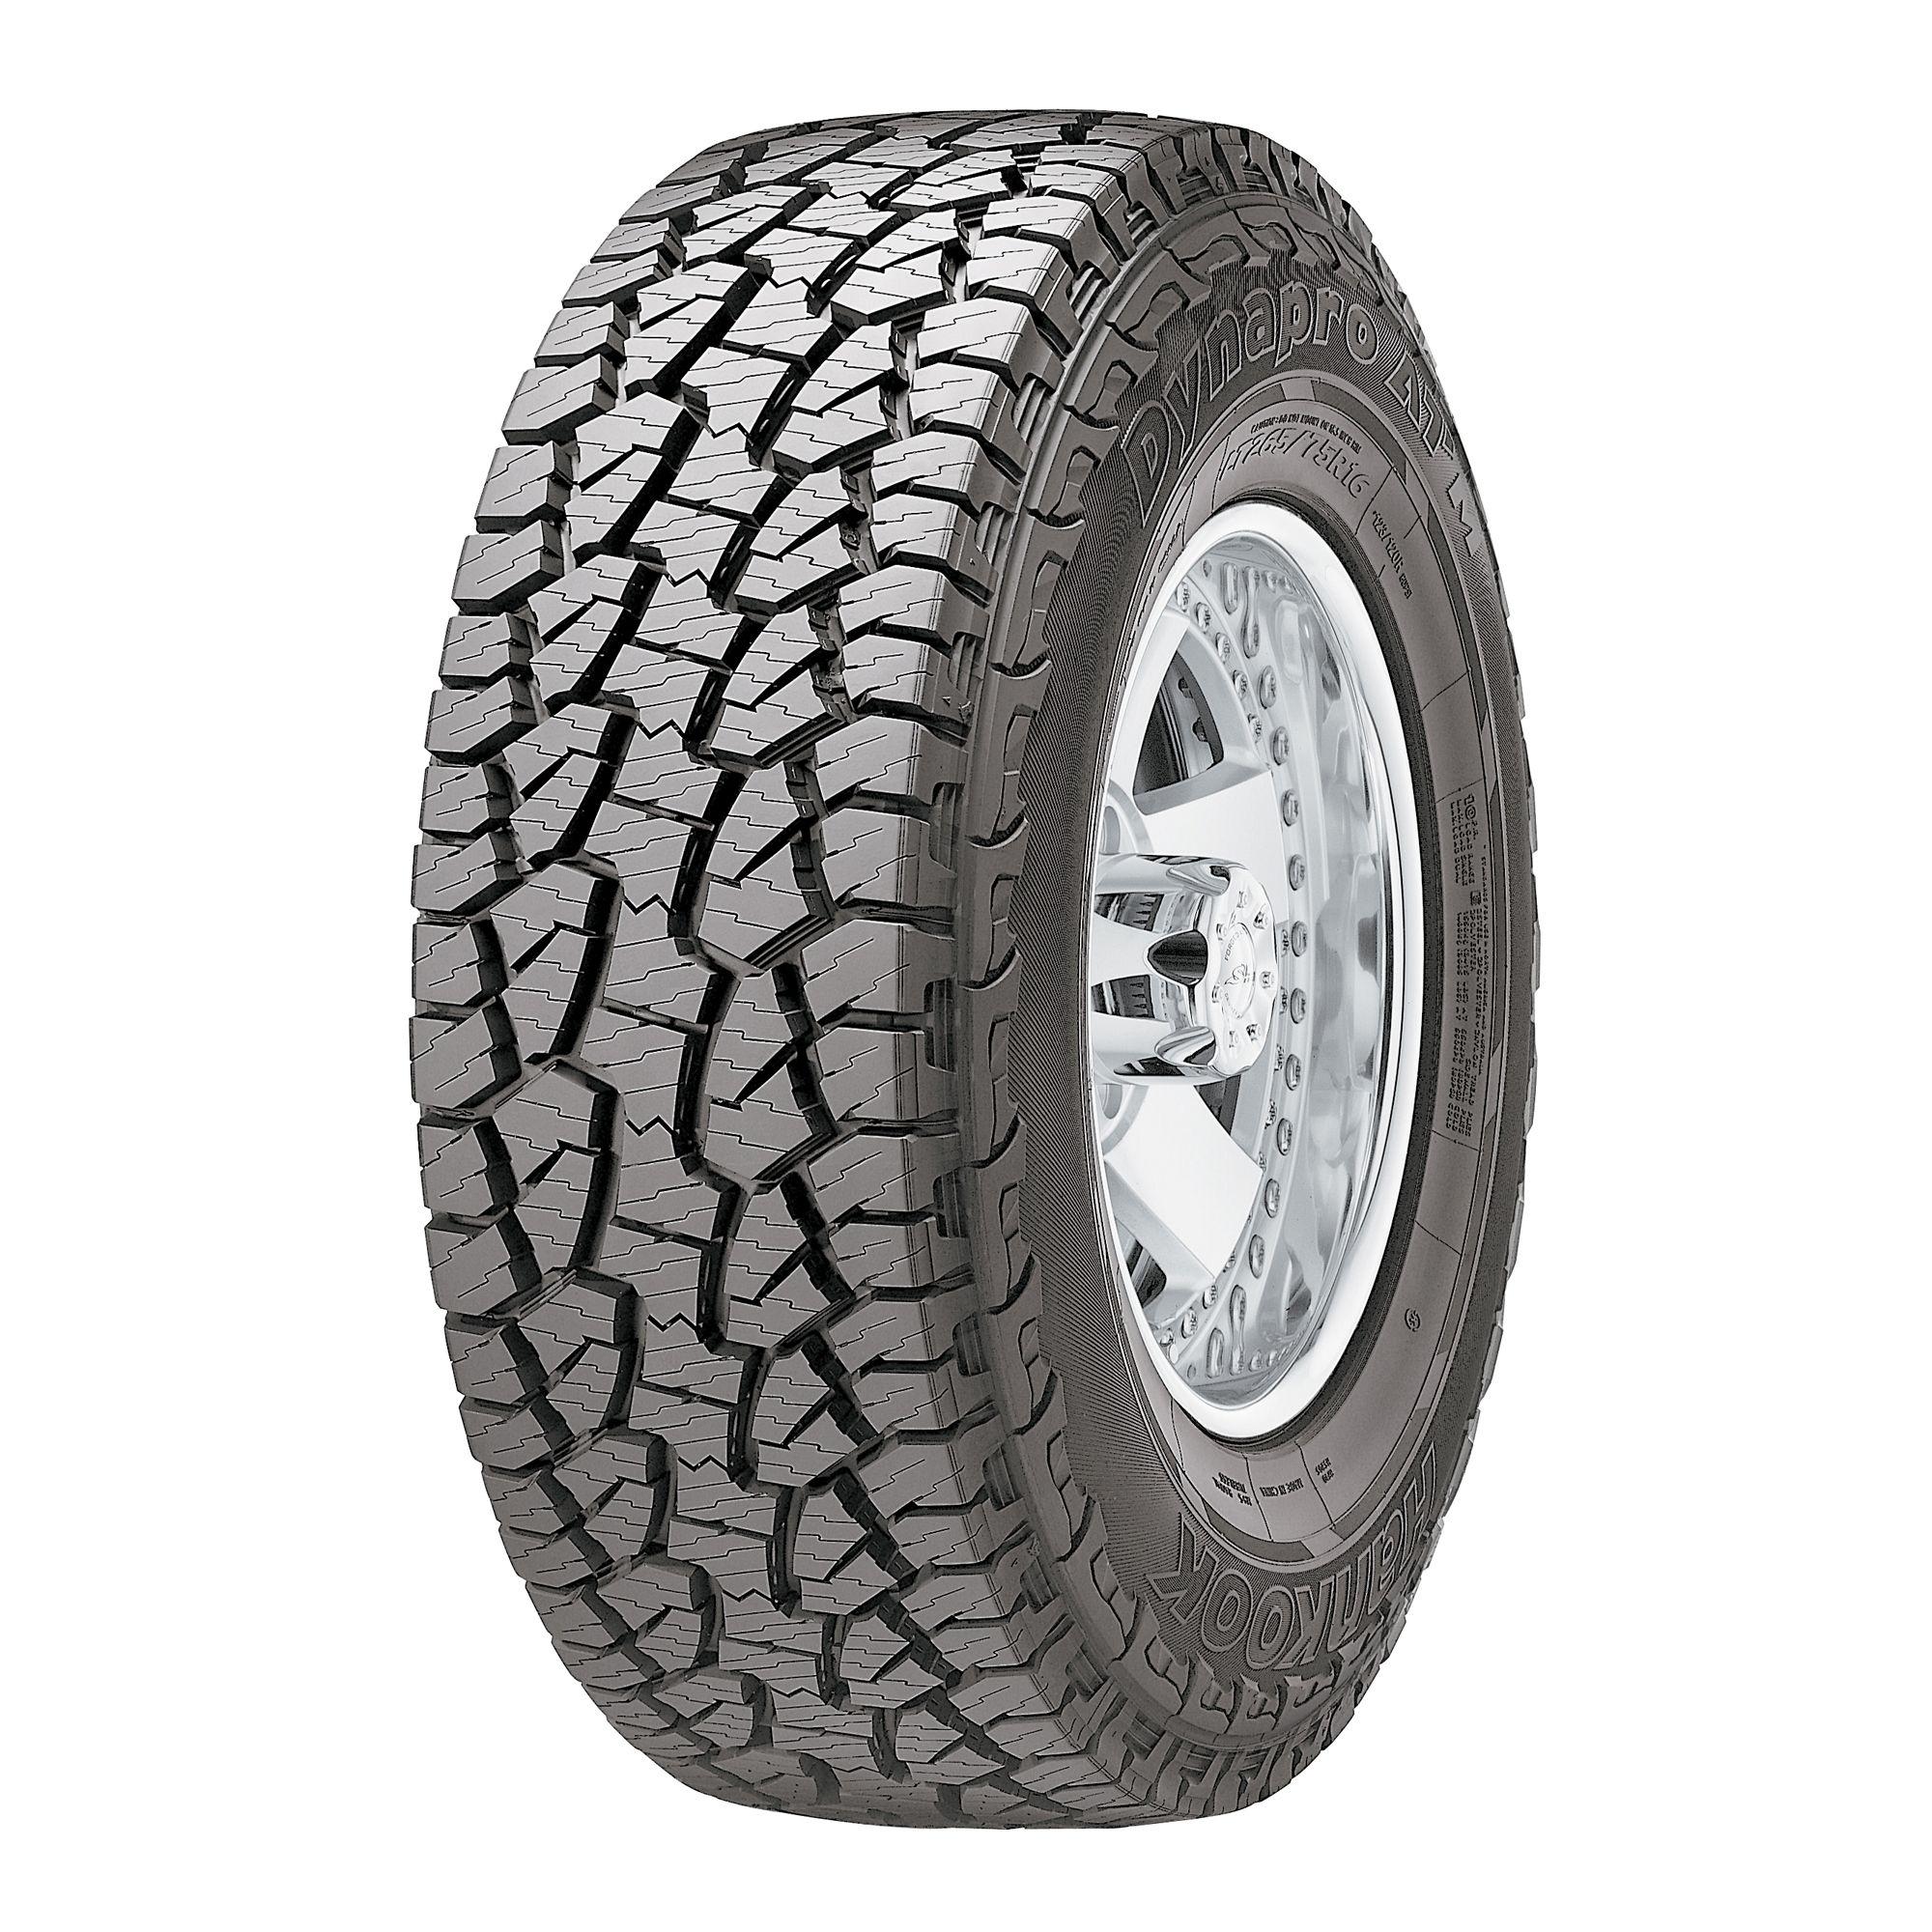 hankook dynapro atm rf10 lt245 70r17e 116r light truck and suv tire shop your way online. Black Bedroom Furniture Sets. Home Design Ideas